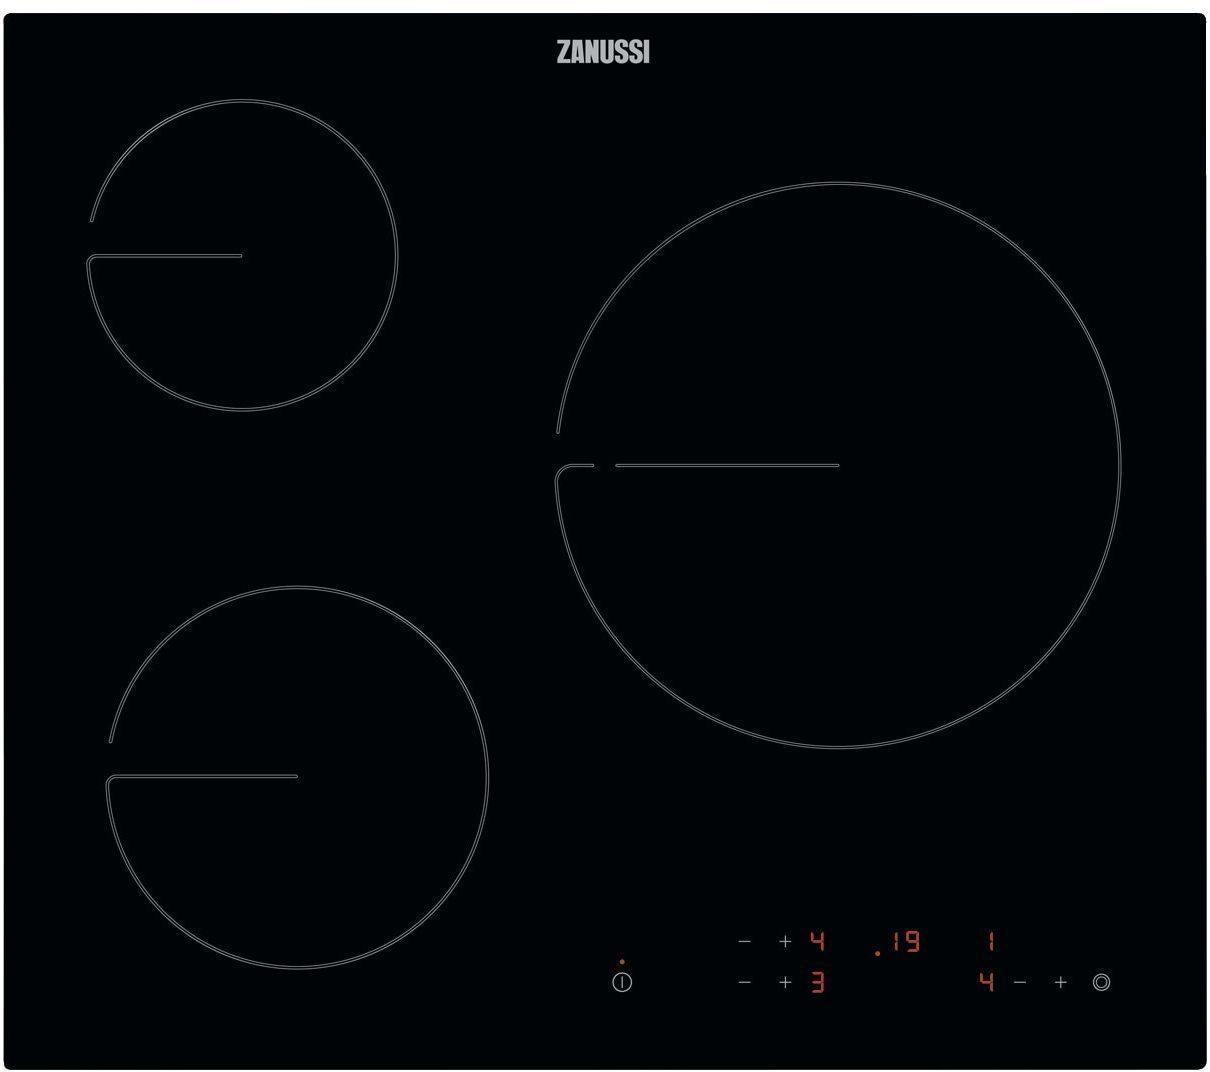 Placa Zanussi ZHRN638K 3vitro Touch